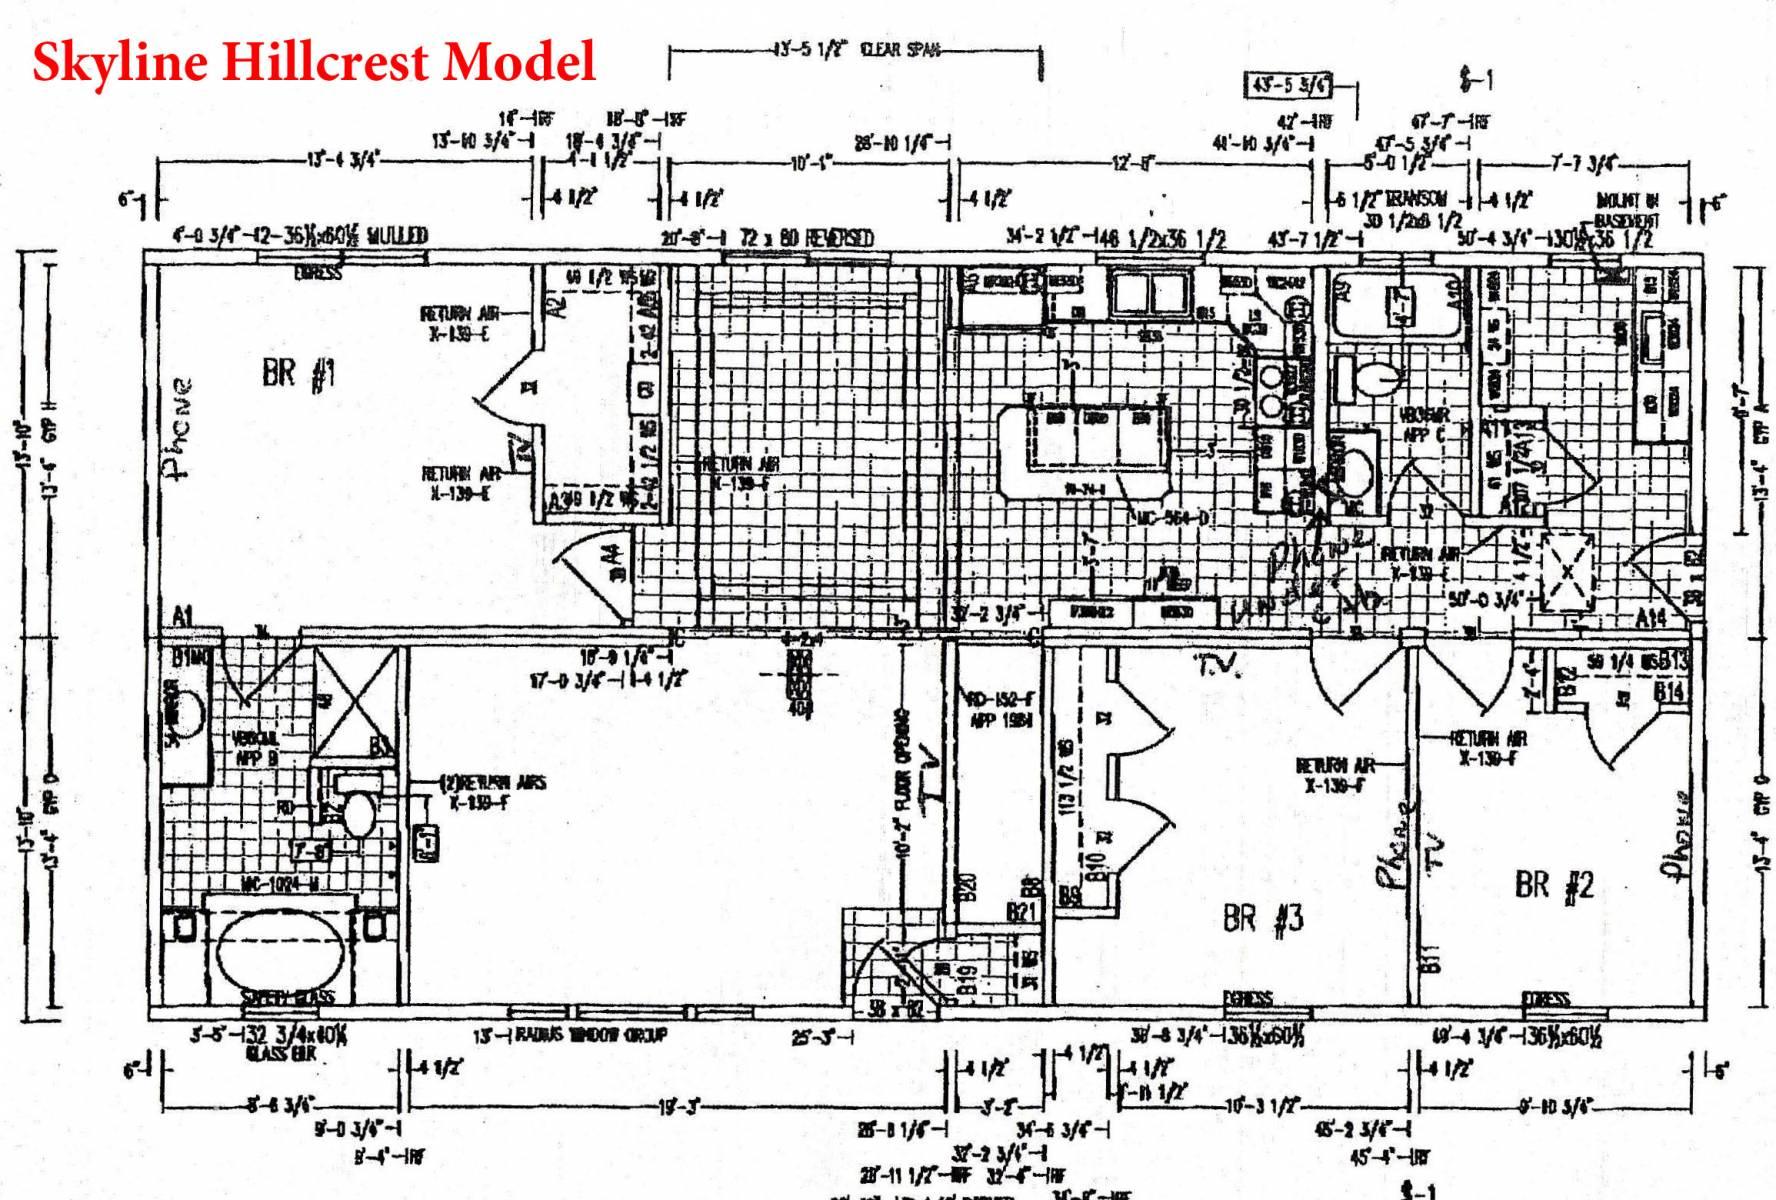 Skyline Hillcrest Modular Home